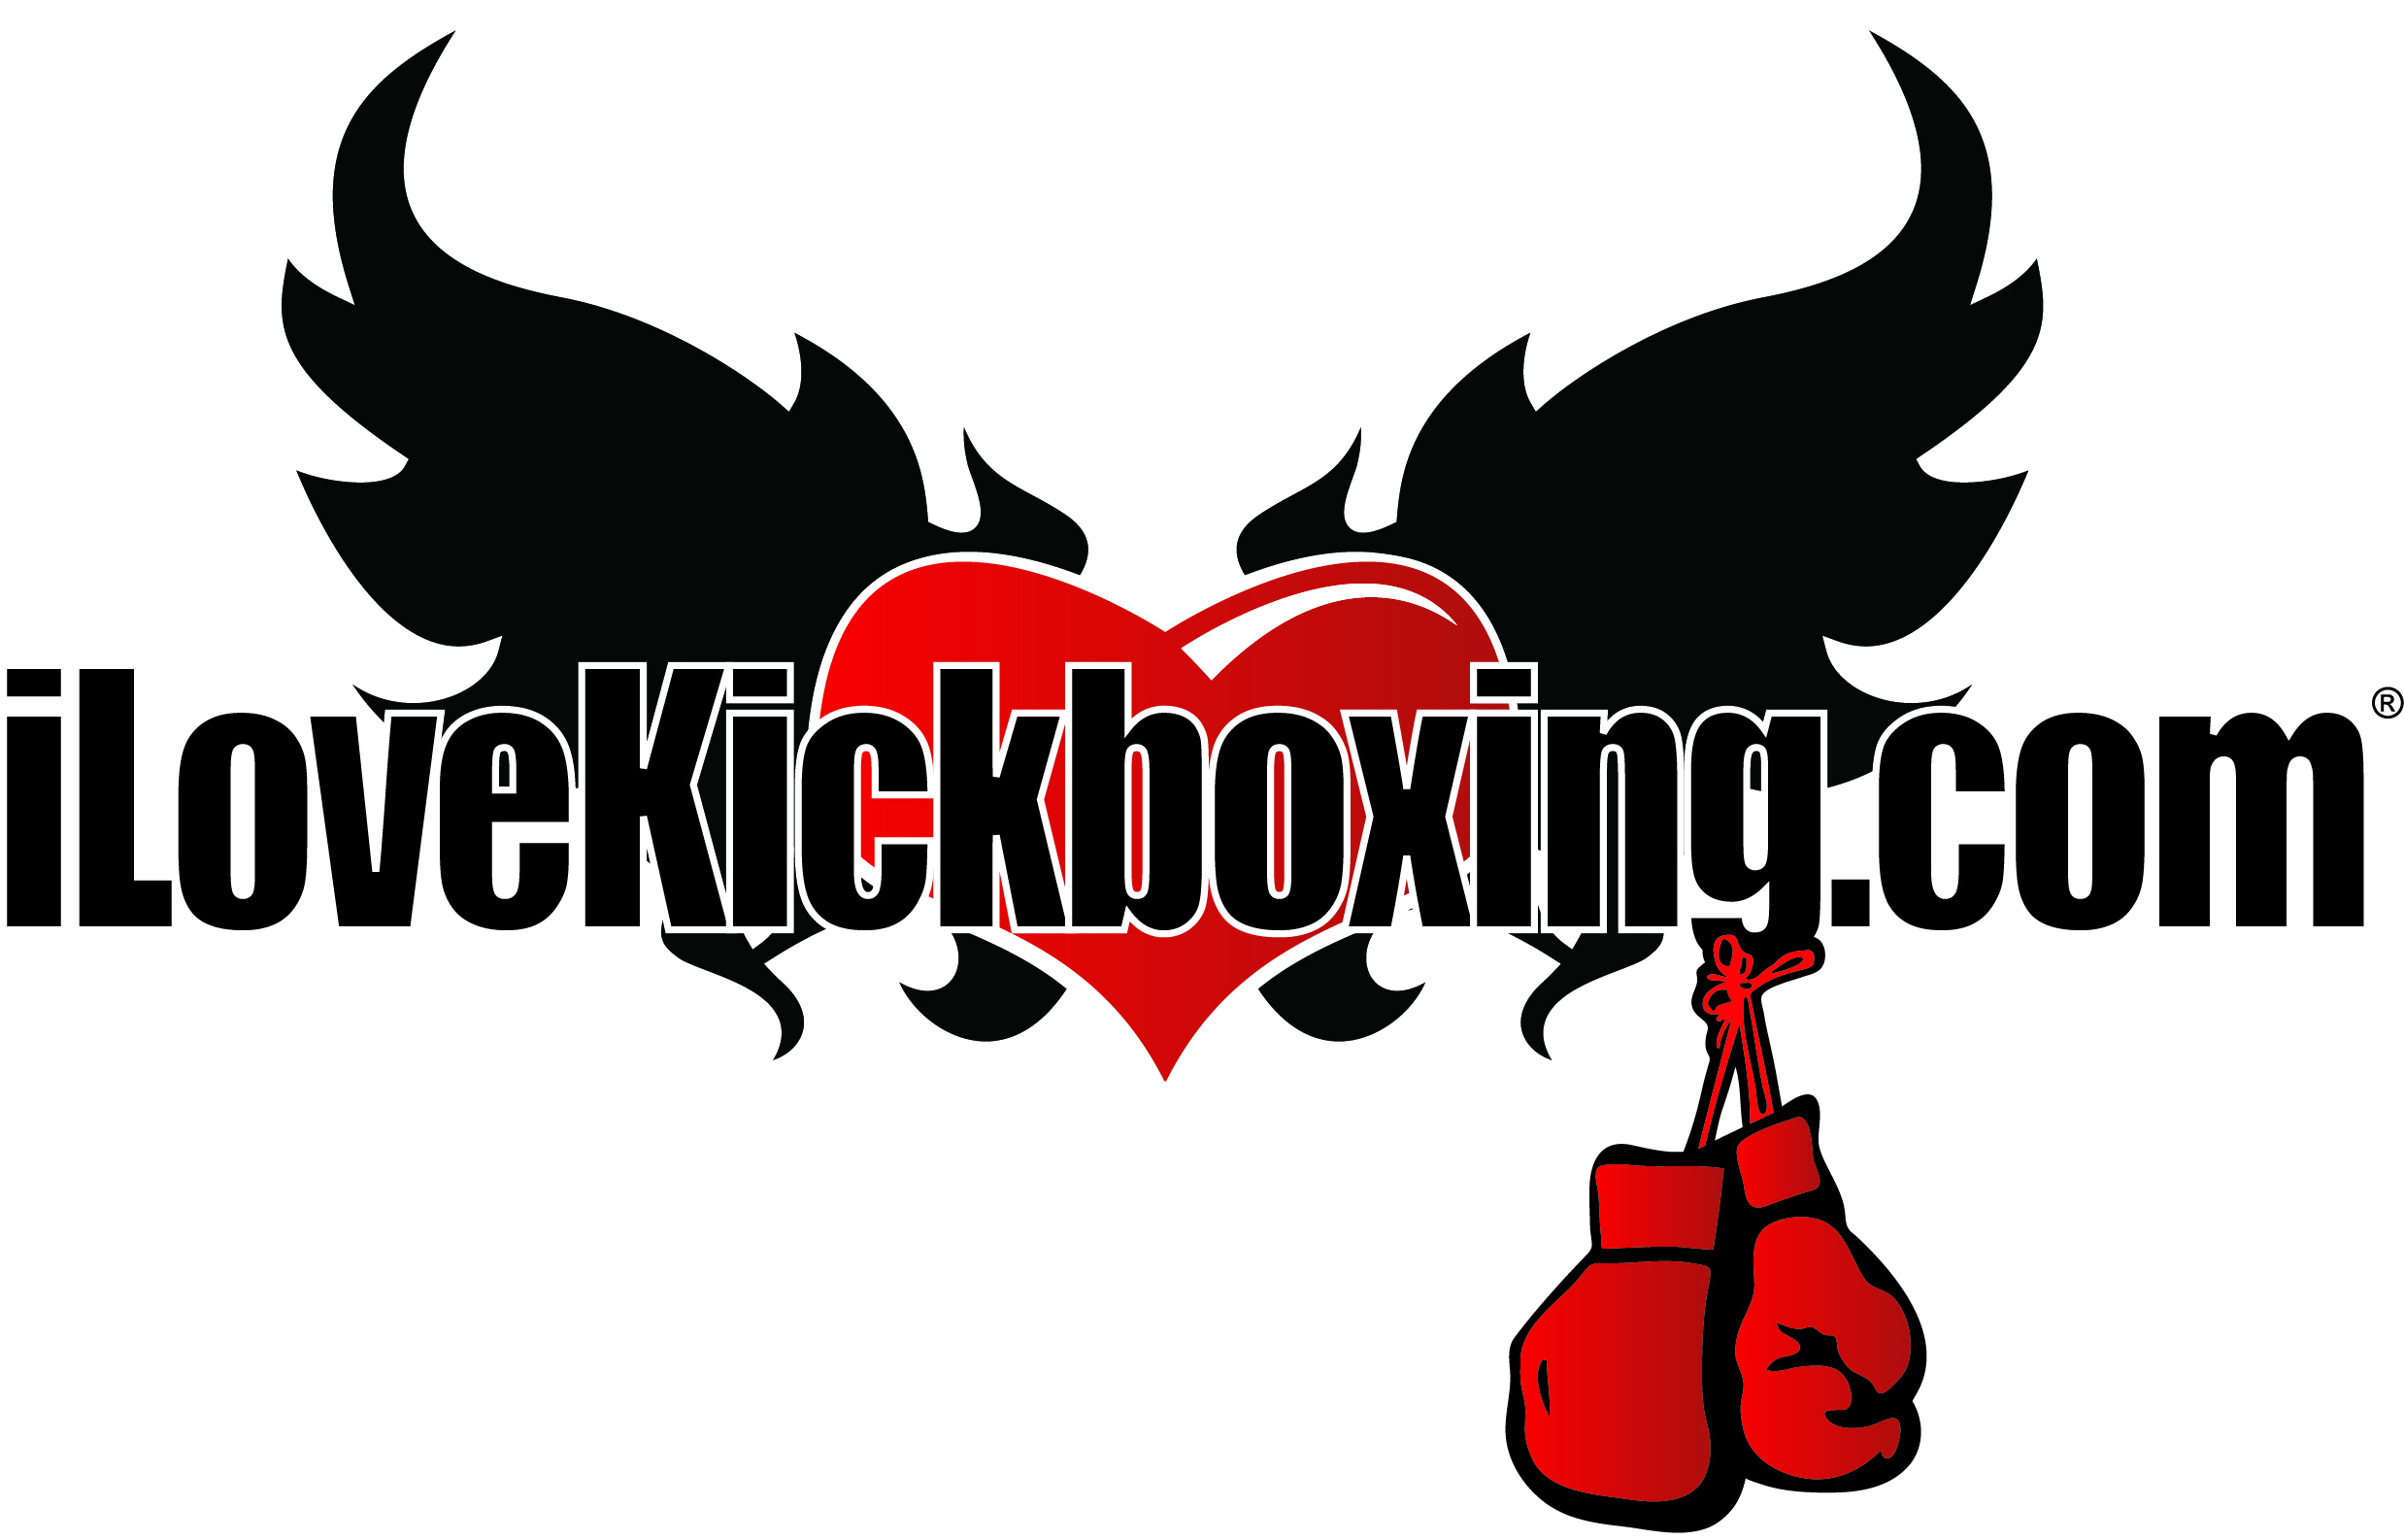 I Love Kickboxing - North Providence - ad image